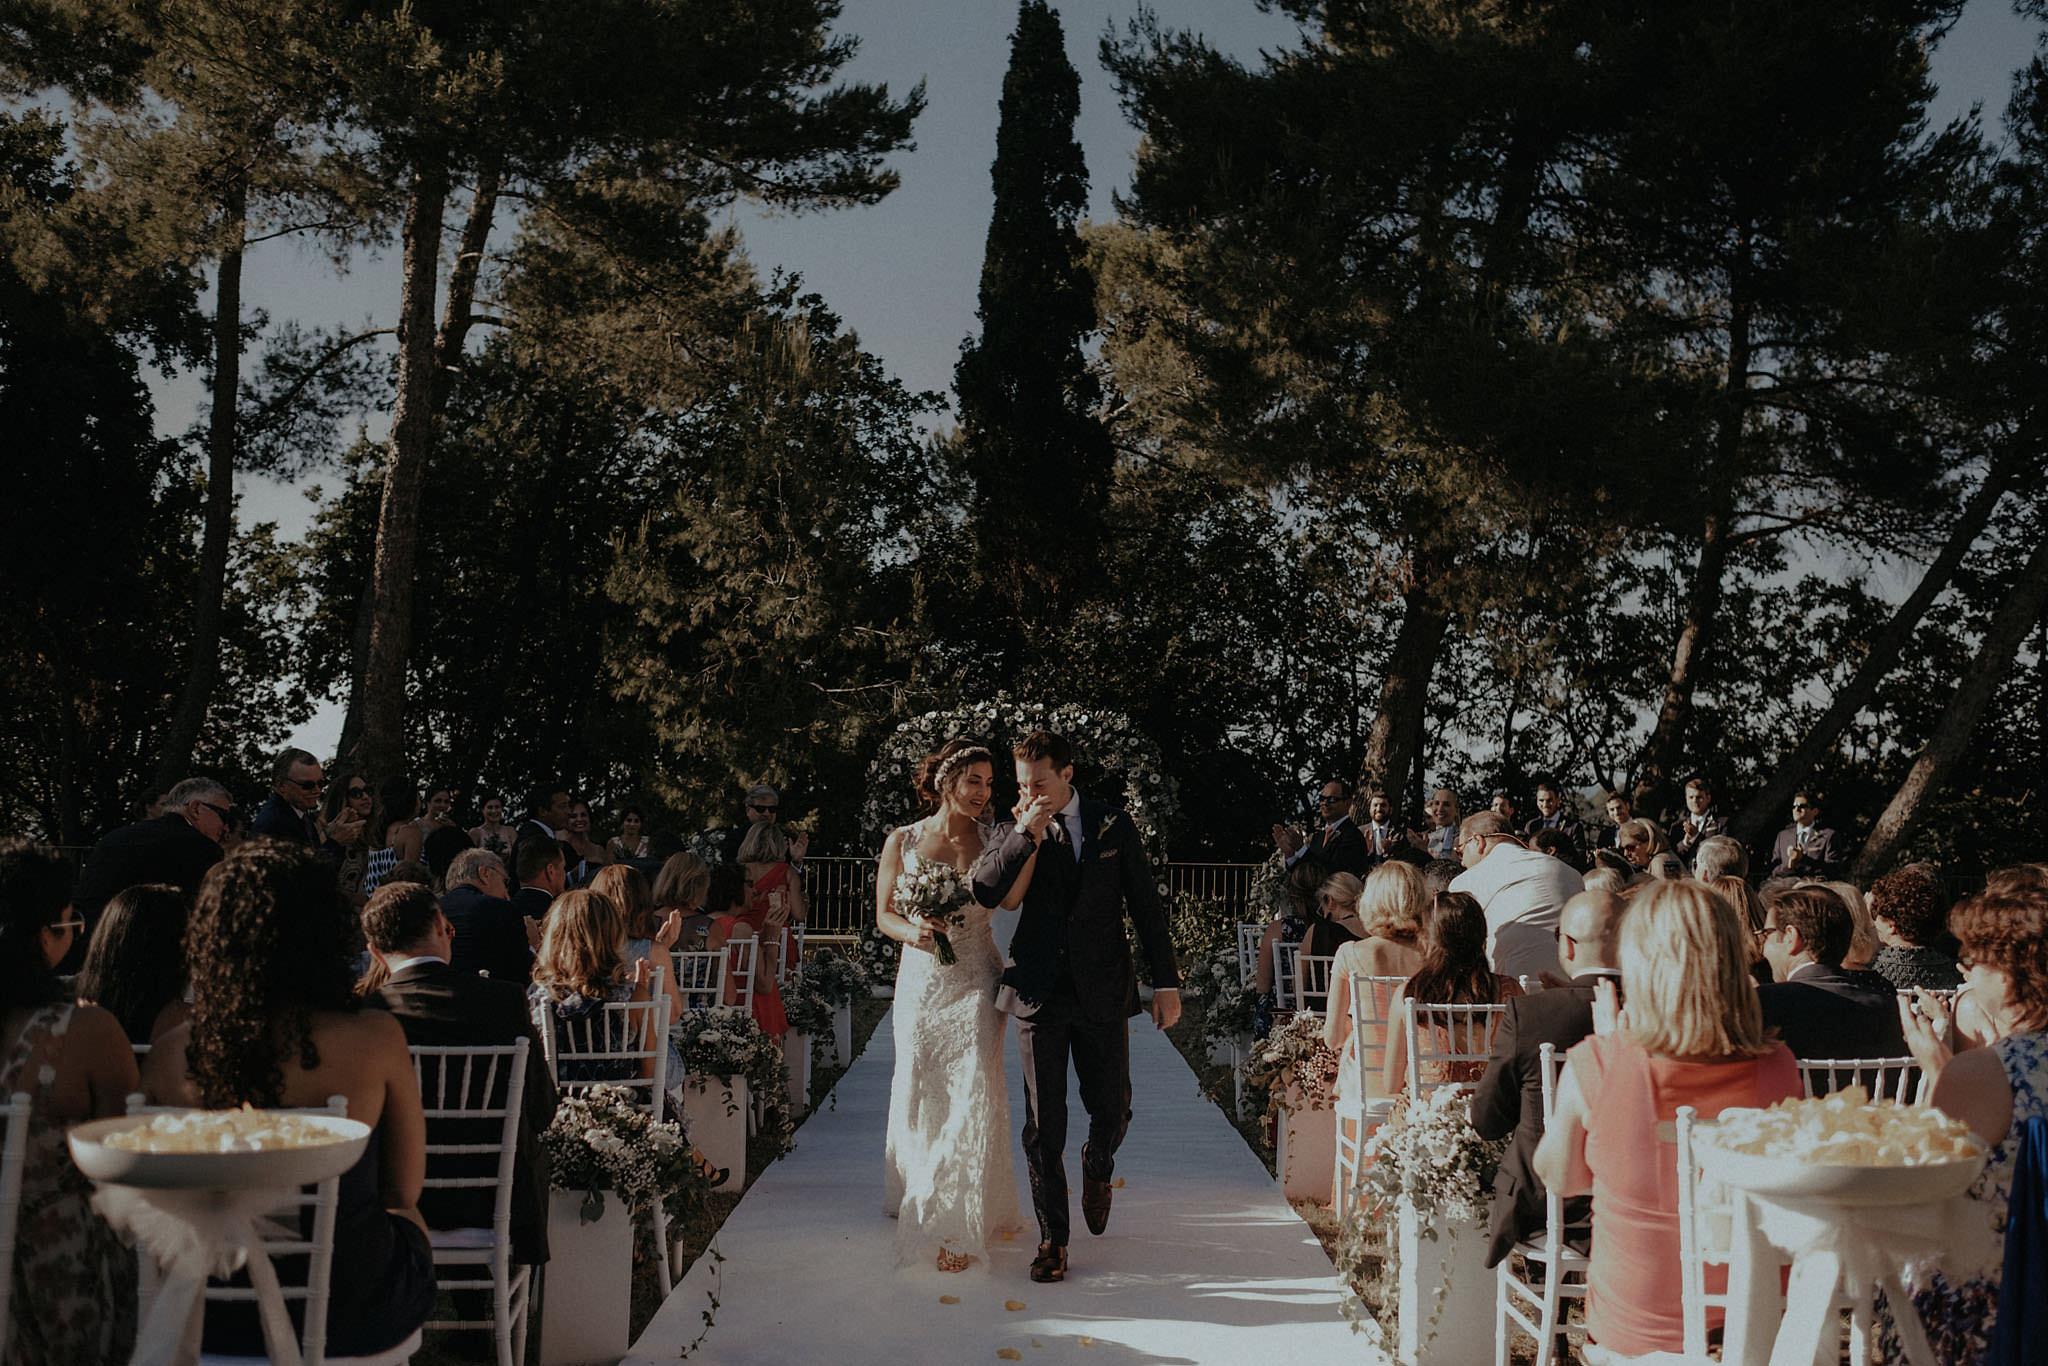 Max-Steph-Italy-Wedding-434.jpg